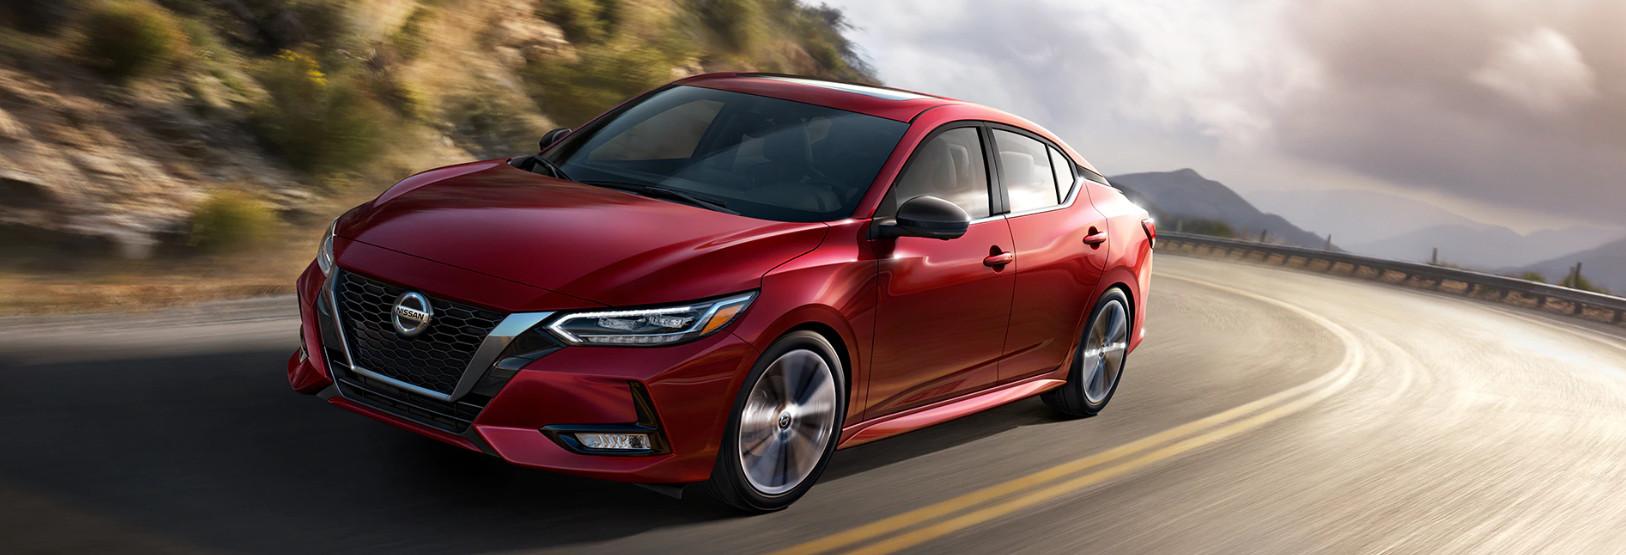 2020 Nissan Sentra vs 2020 Honda Civic near Worcester, MA